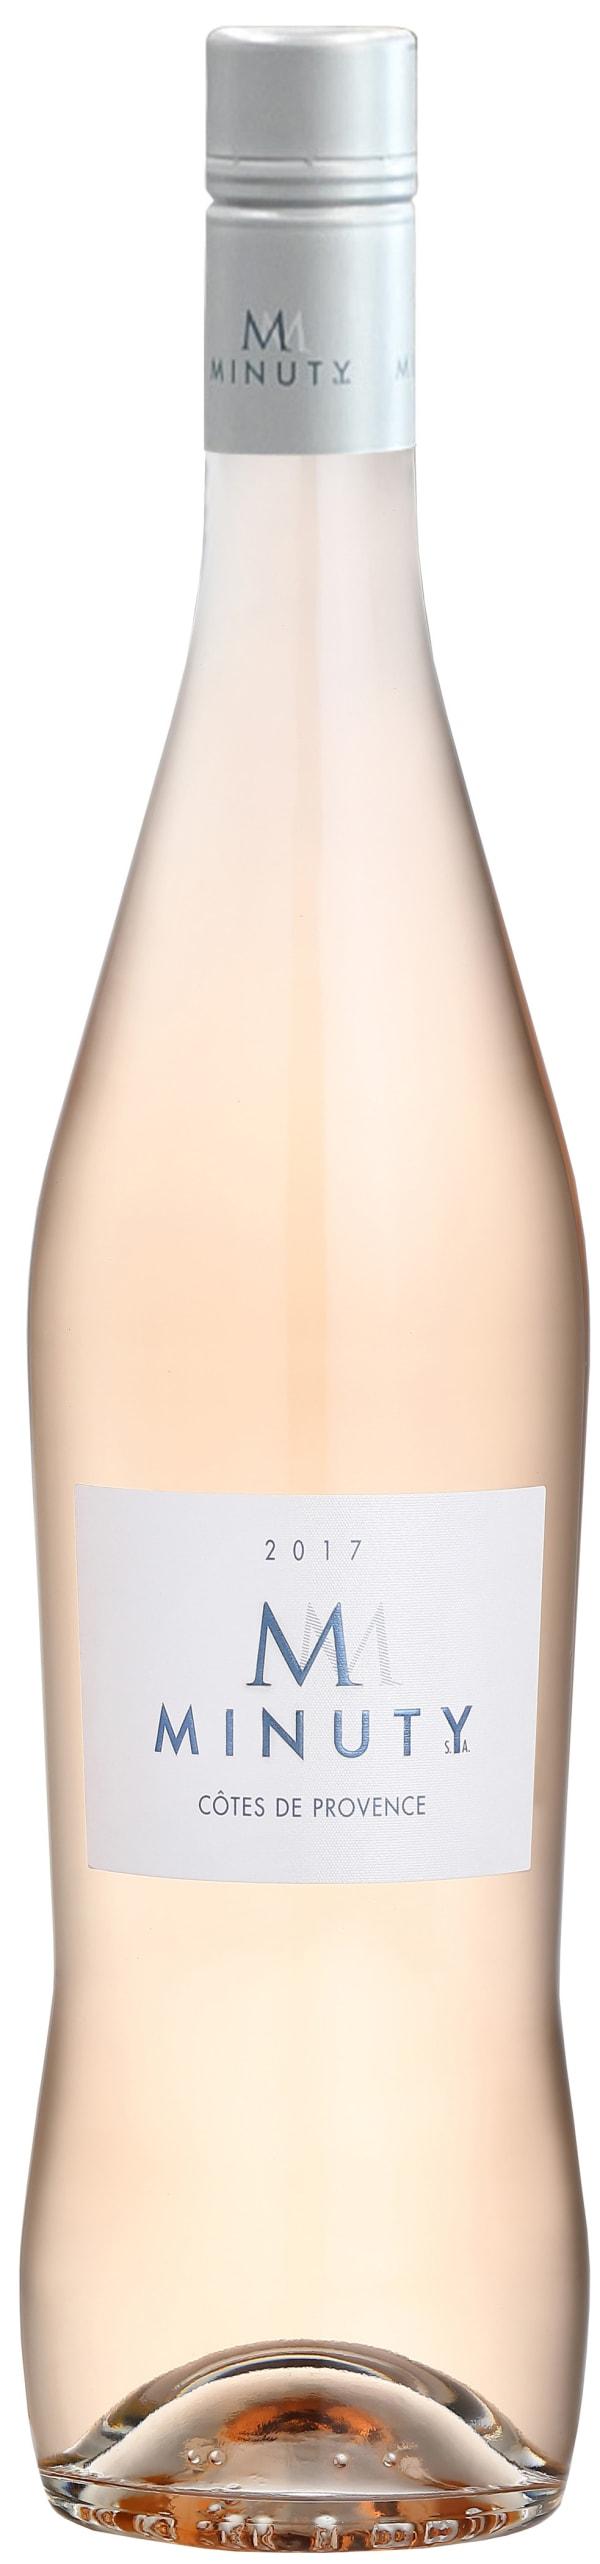 Château Minuty M Rosé 2016